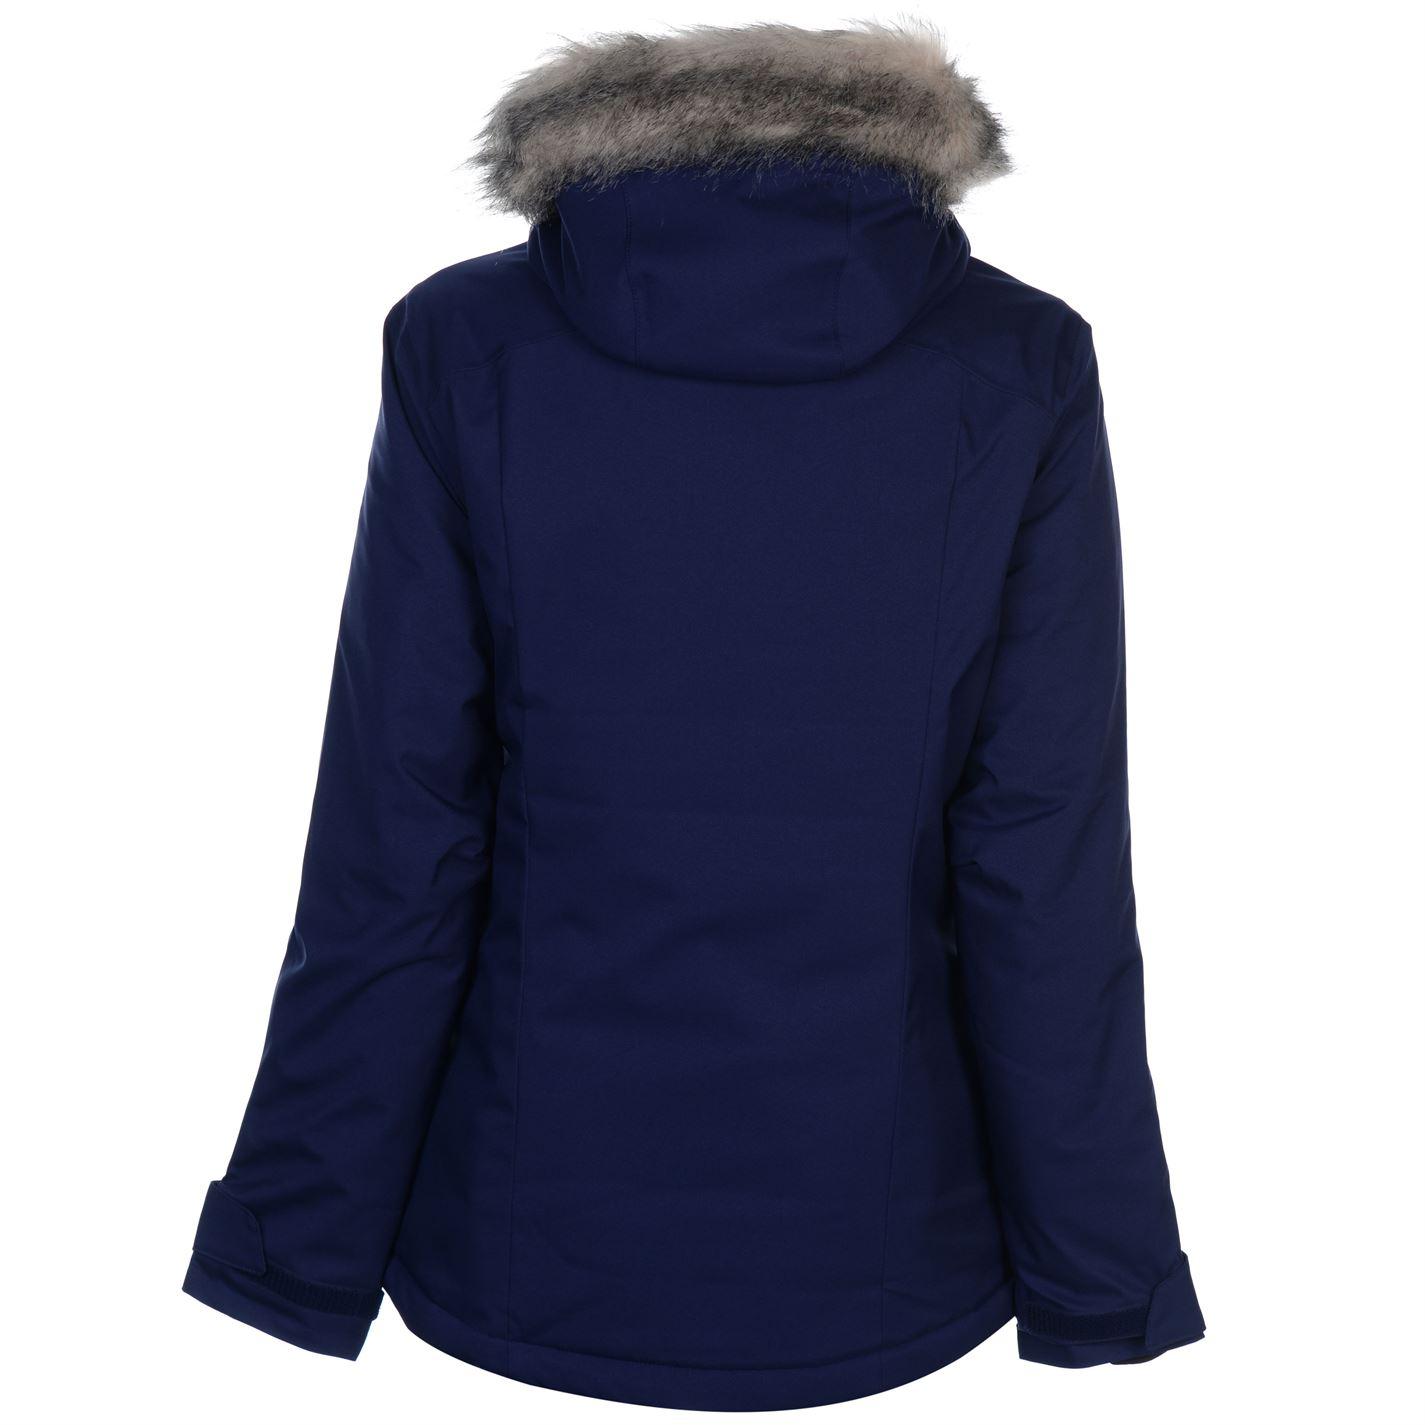 abe747c8c Salomon Rise Ski Jacket Ladies Coat Top Water Repellent Zip Zipped ...